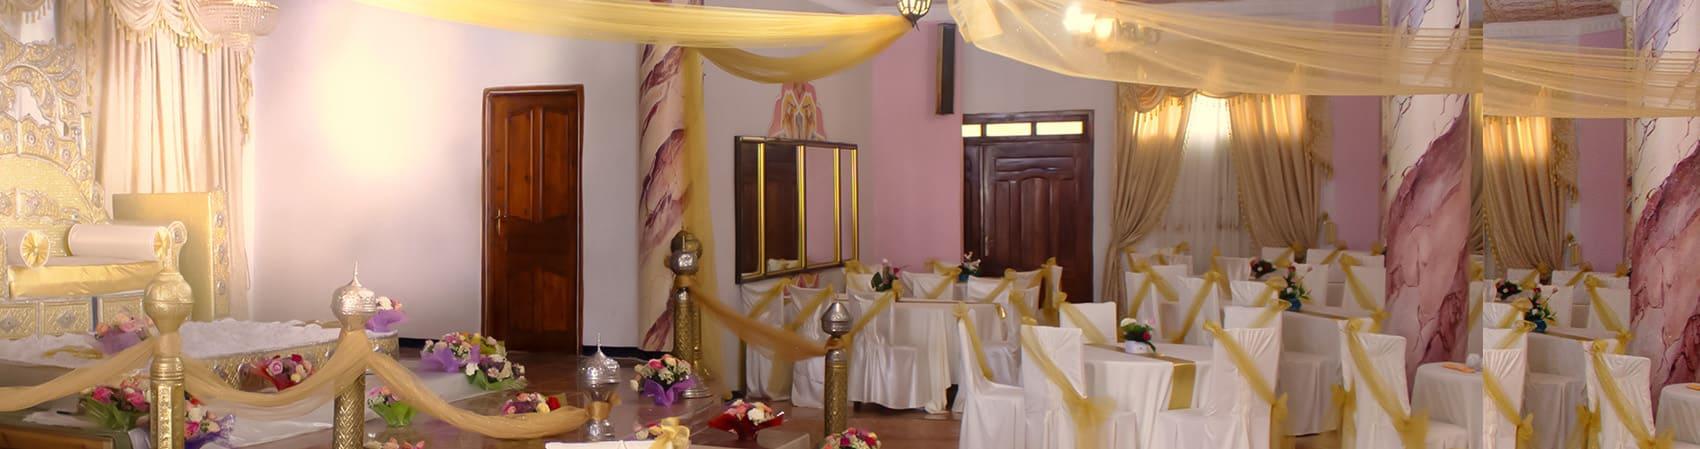 trones-angle-salles-fetes-complexe-adim-hotel-boumerdes-complexe-algerie-hotel-Zemmouri-El Bahri-Zemmouri-Algerie-1700x449